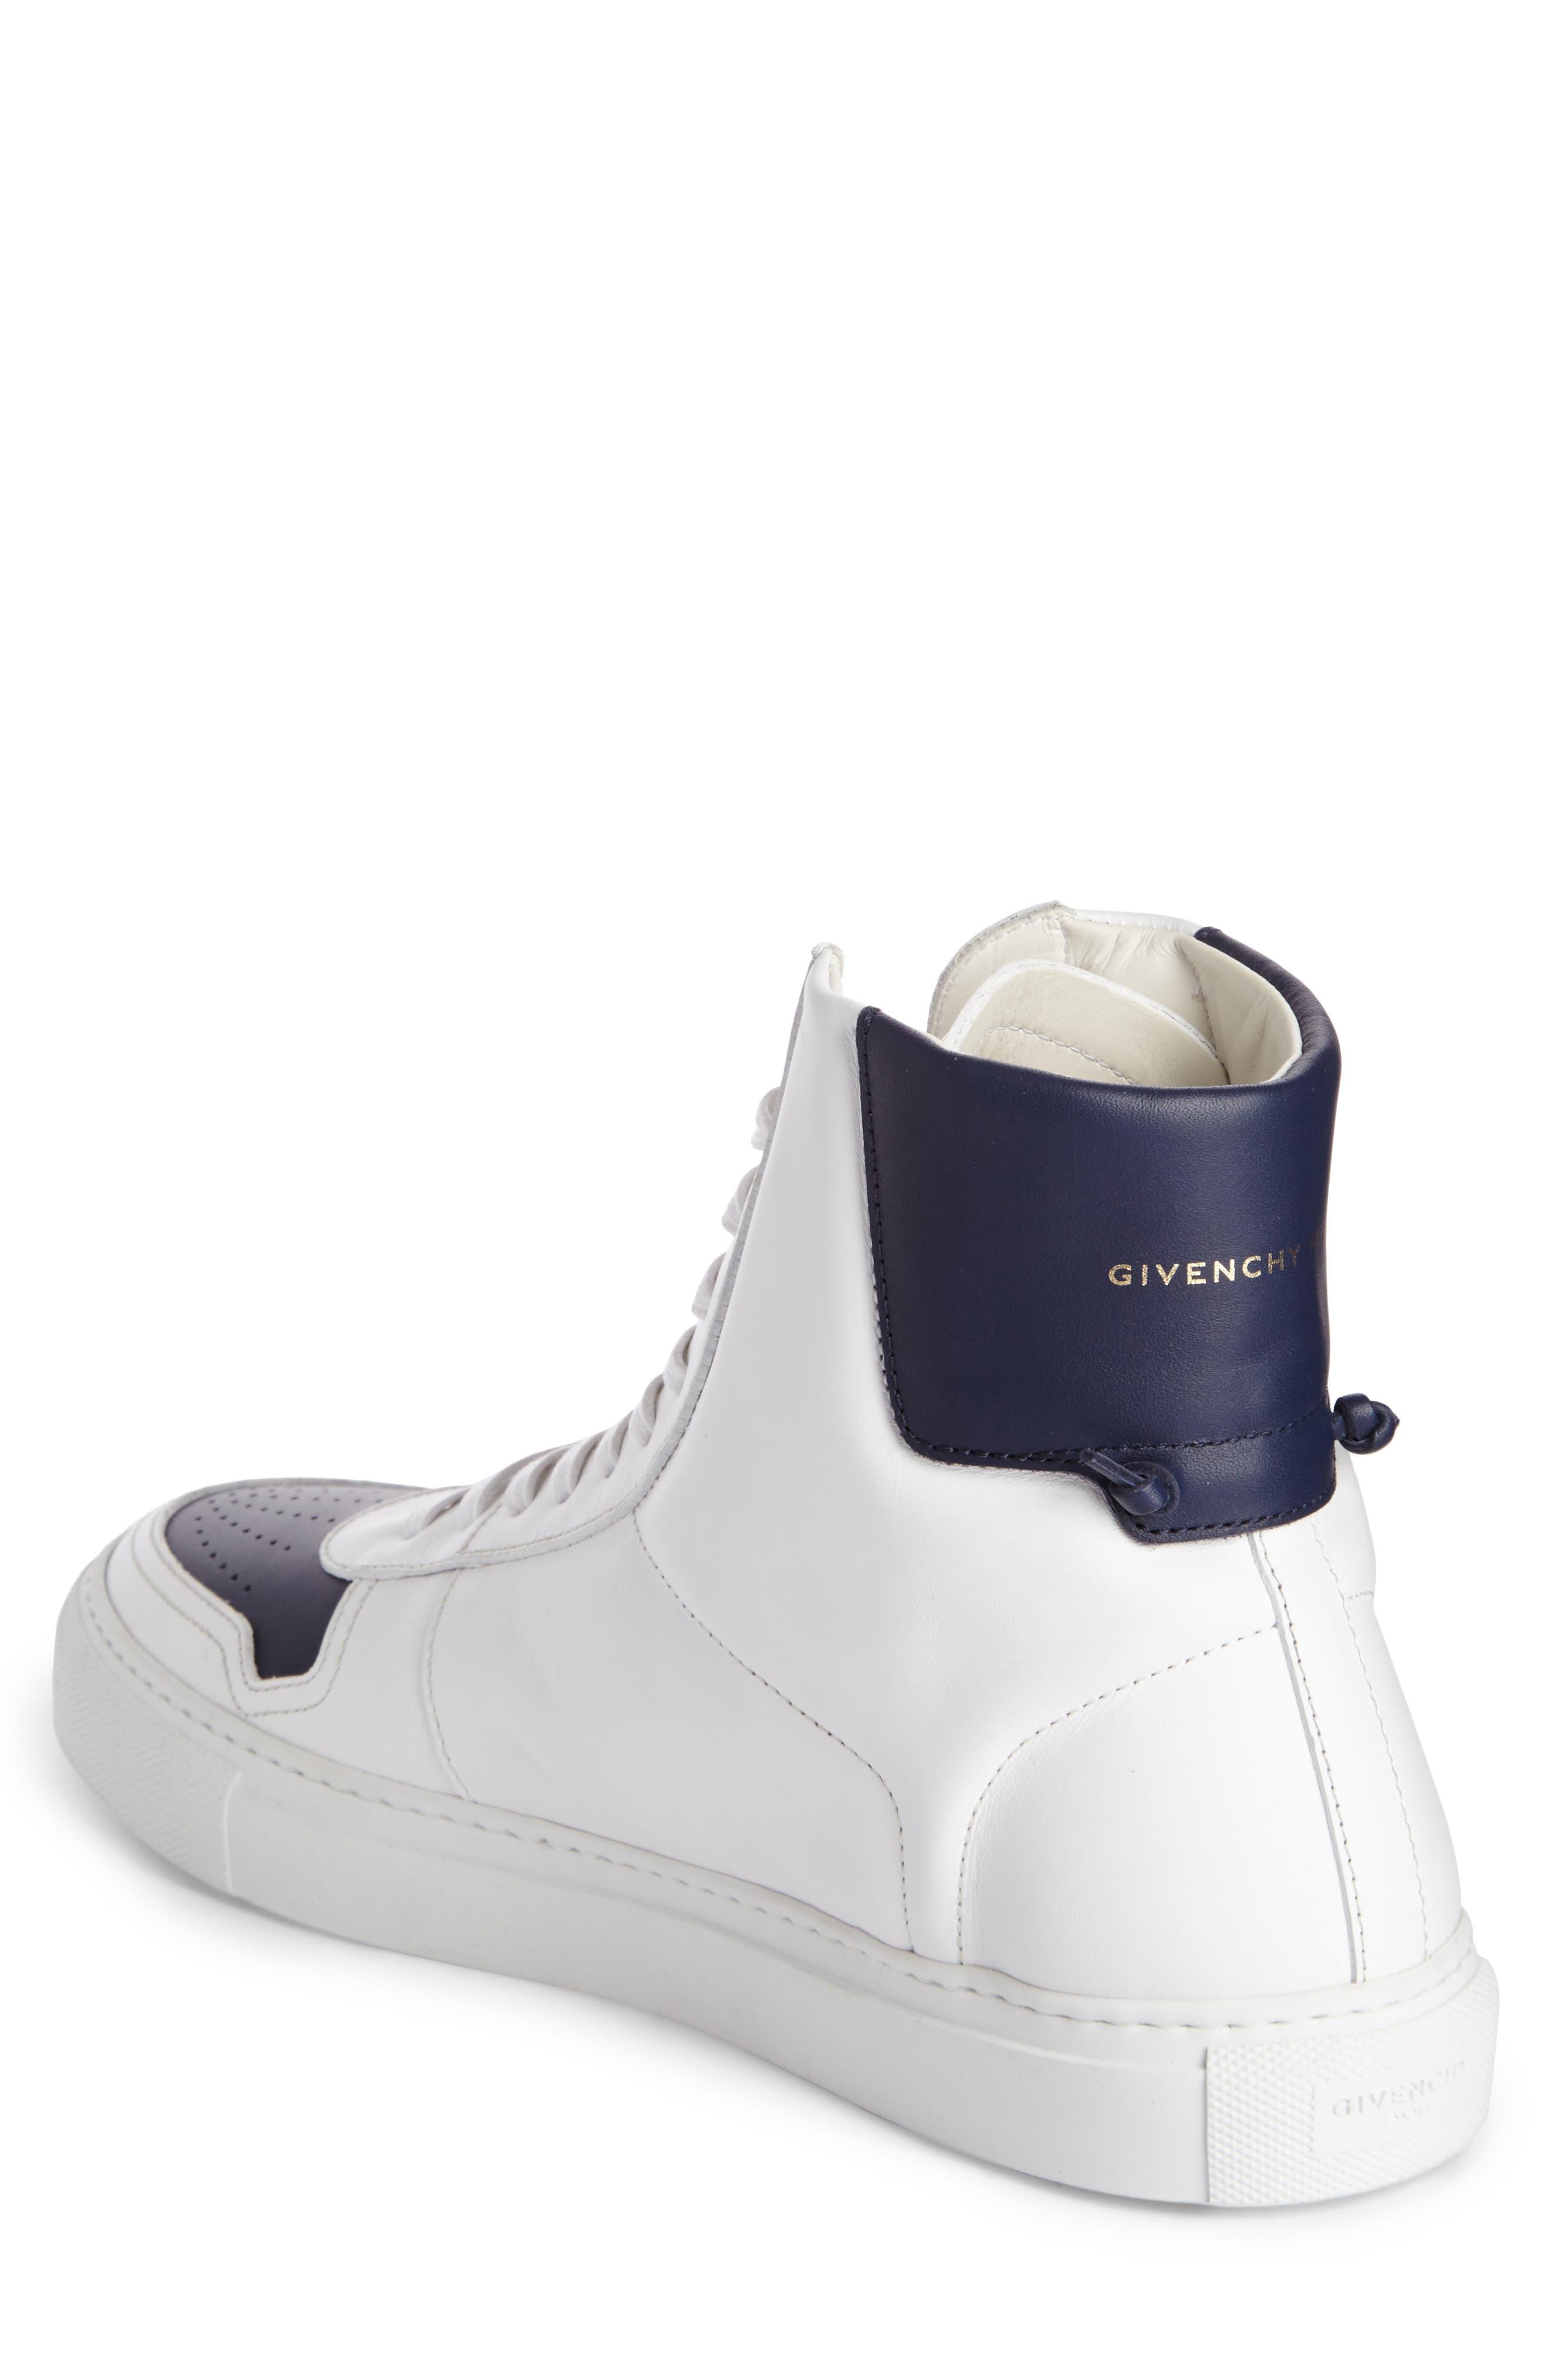 High Top Sneaker,                             Alternate thumbnail 2, color,                             131